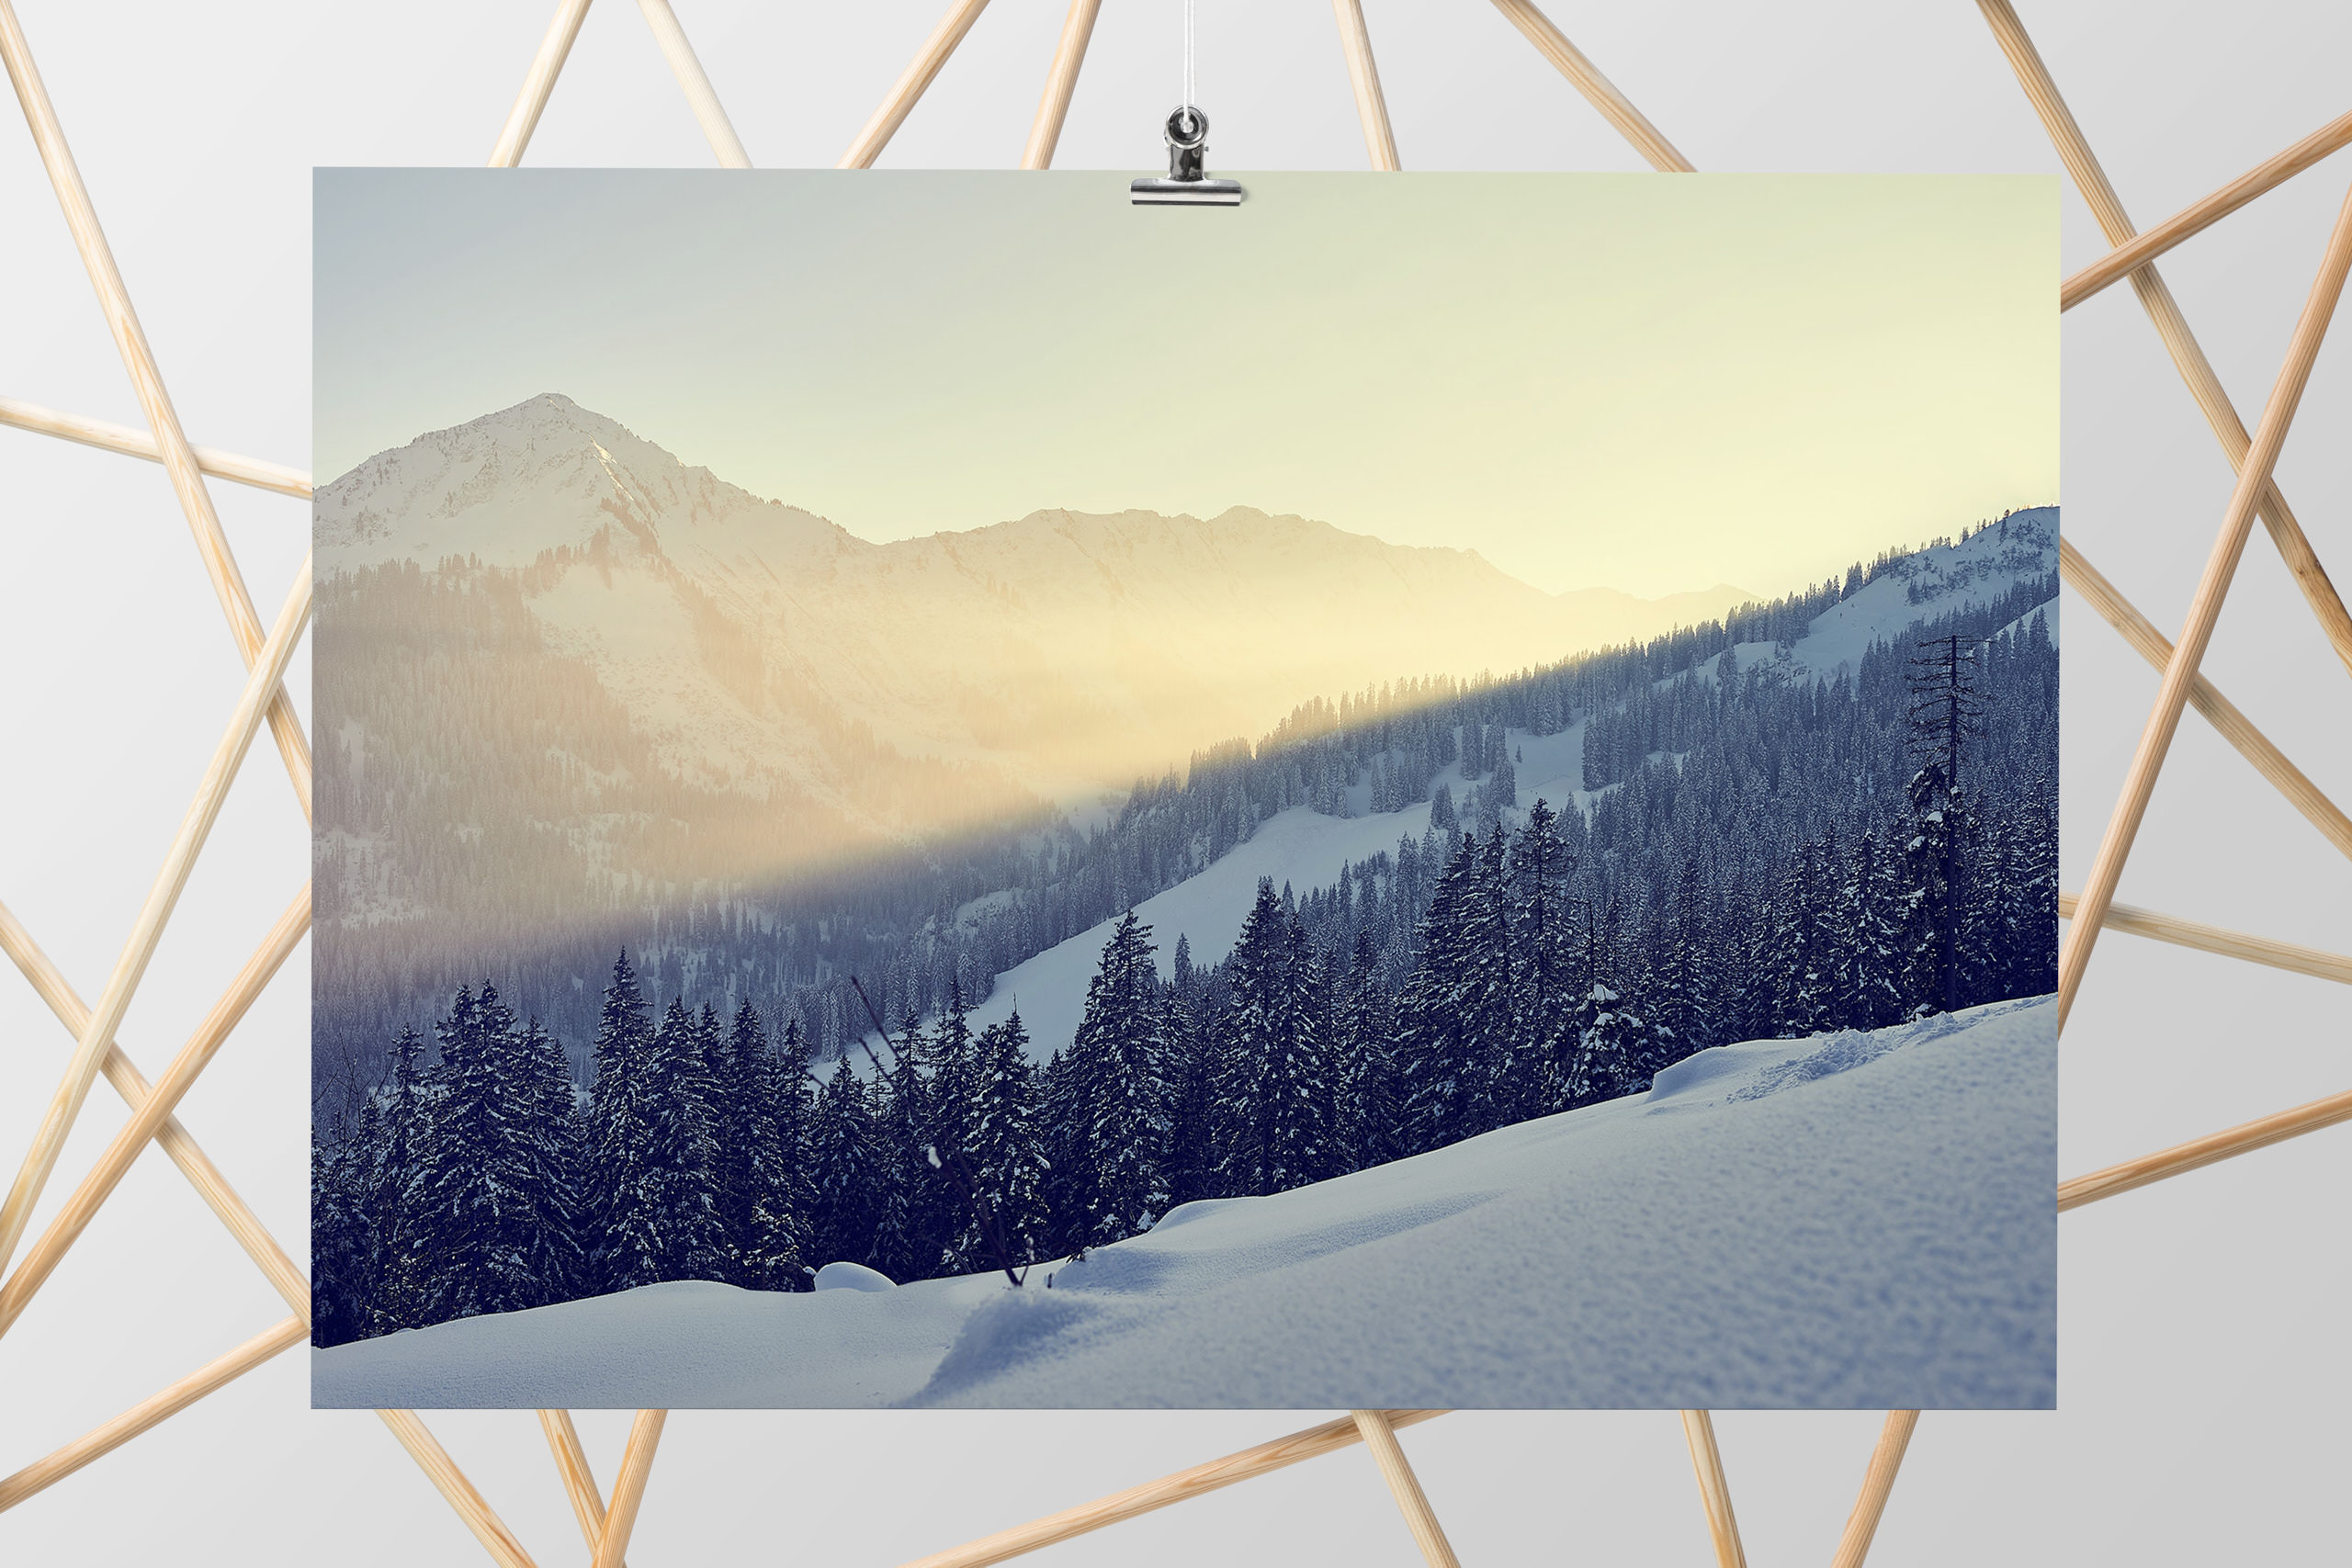 Sonnenuntergang in Kleinwalsertal im Winter